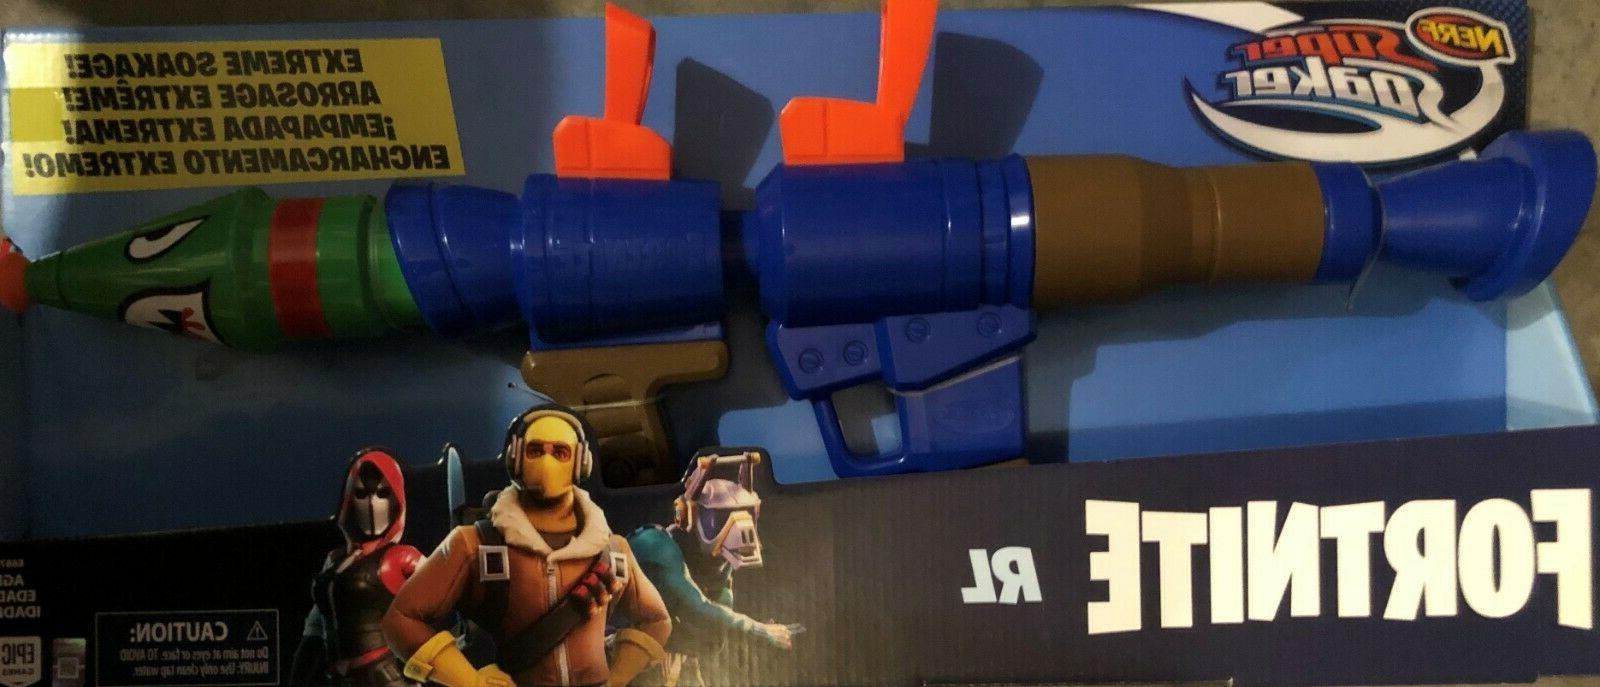 NERF SUPER SOAKER Fortnite Blasters, Water Guns, and